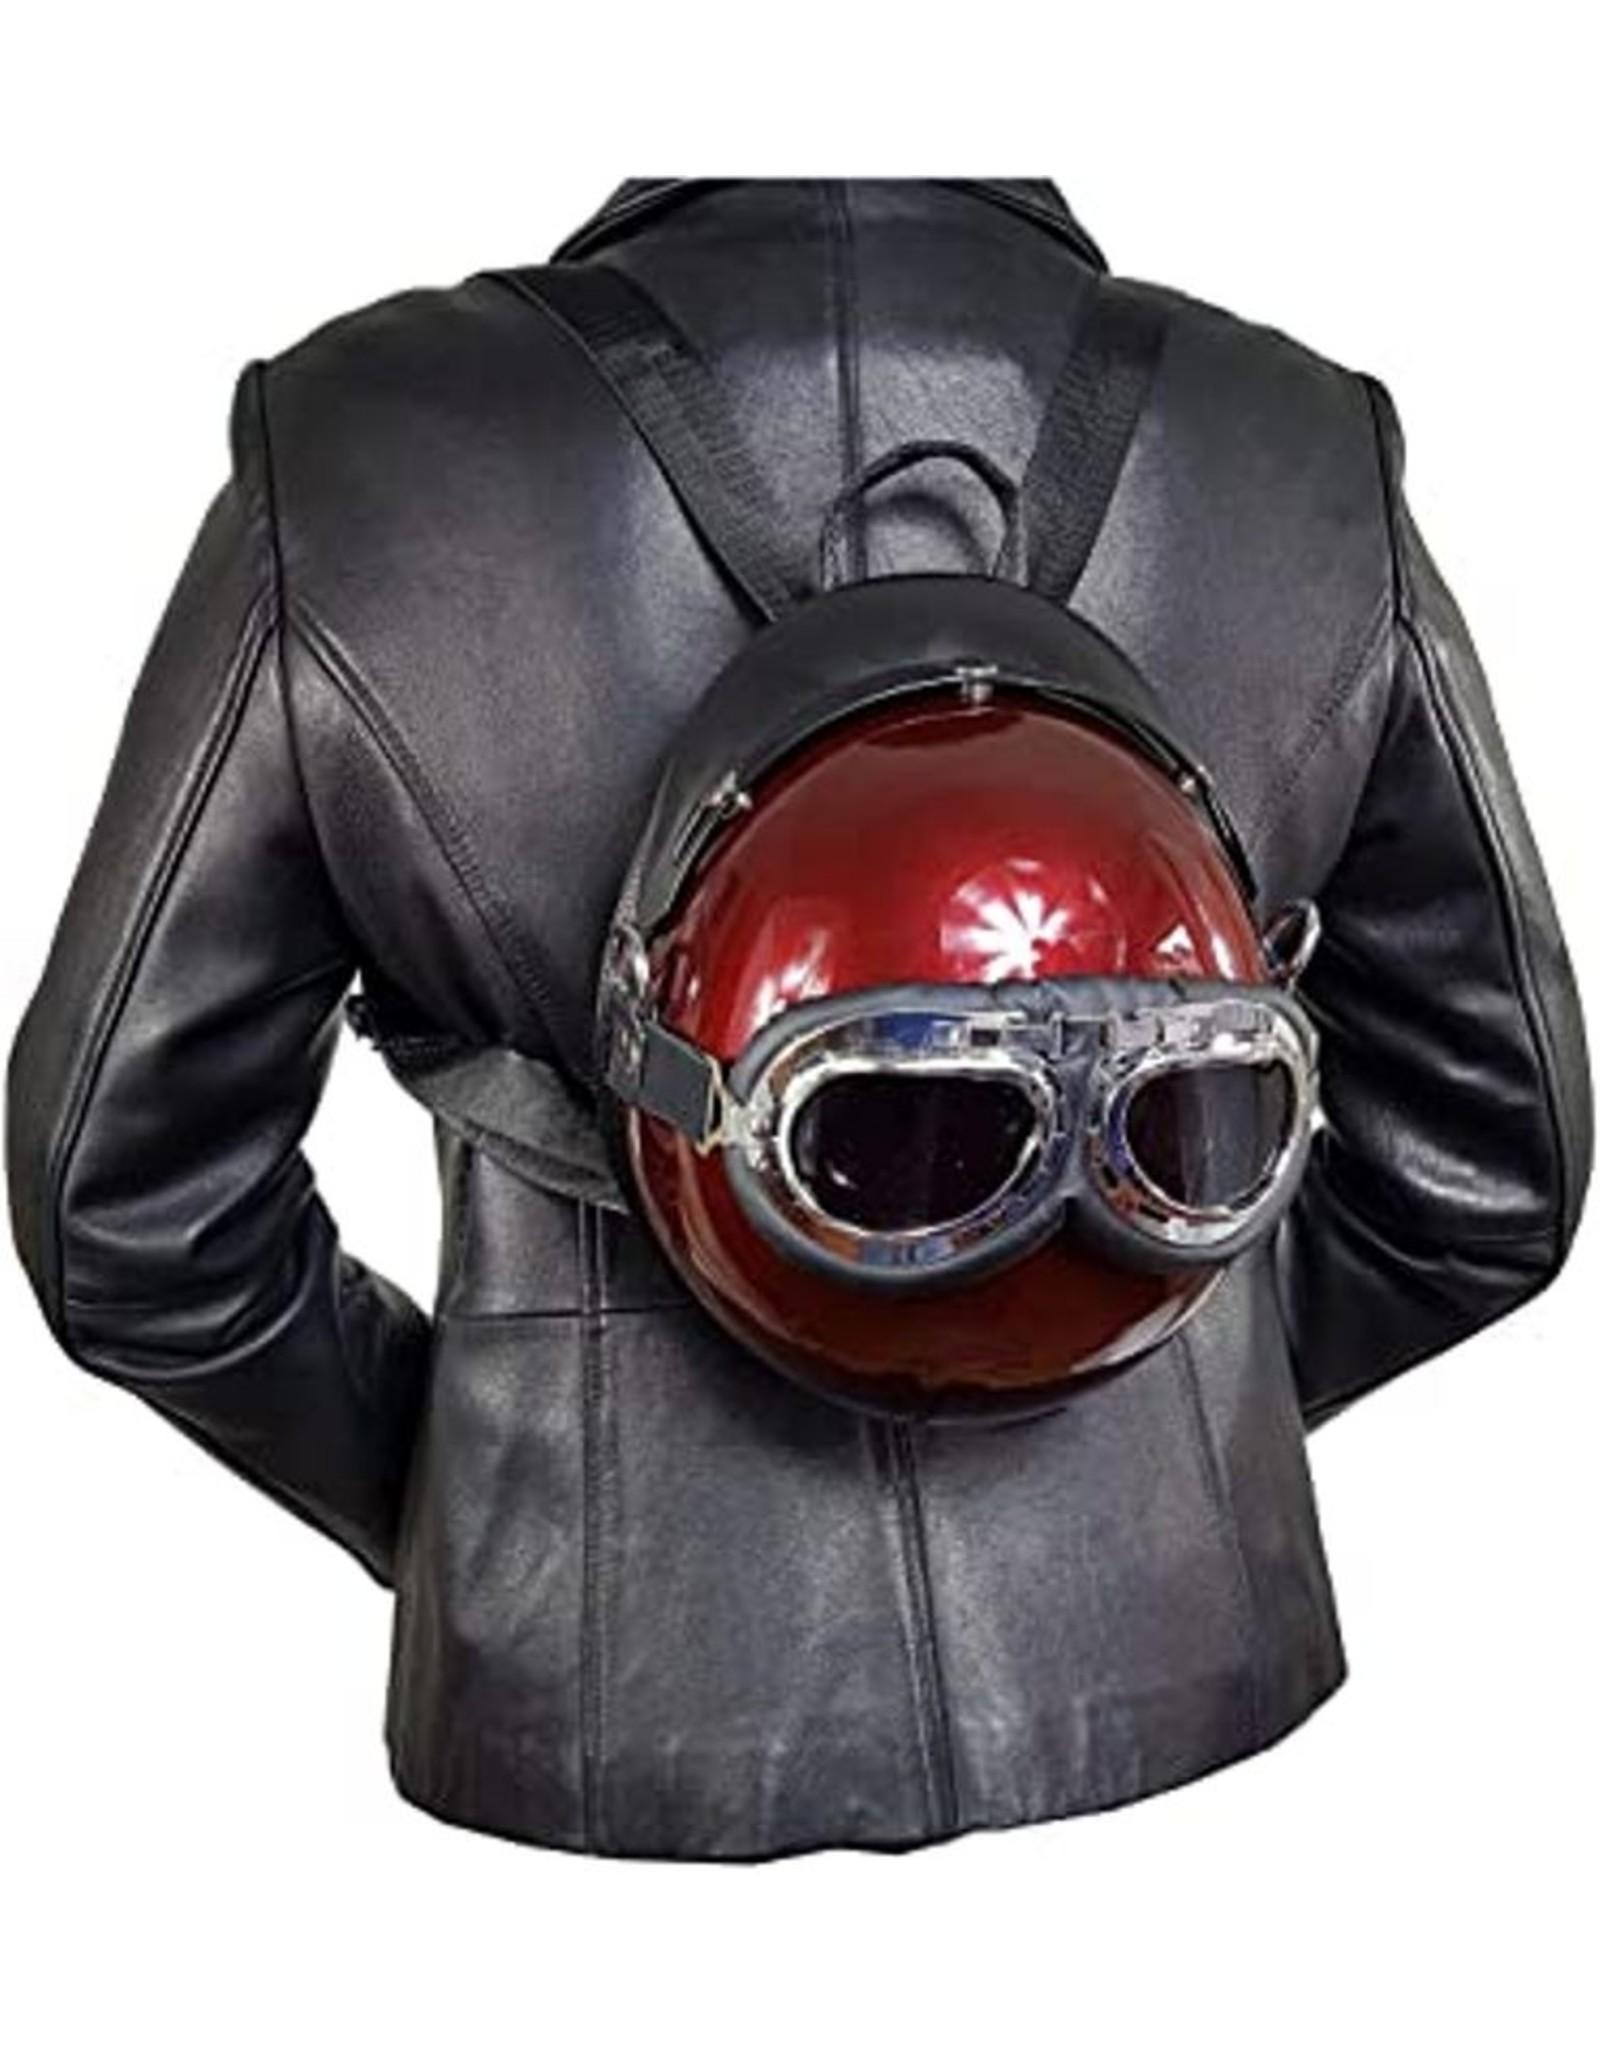 Magic Bags Fantasy bags and wallets - Motorbike helmet backpack-shoulder bag